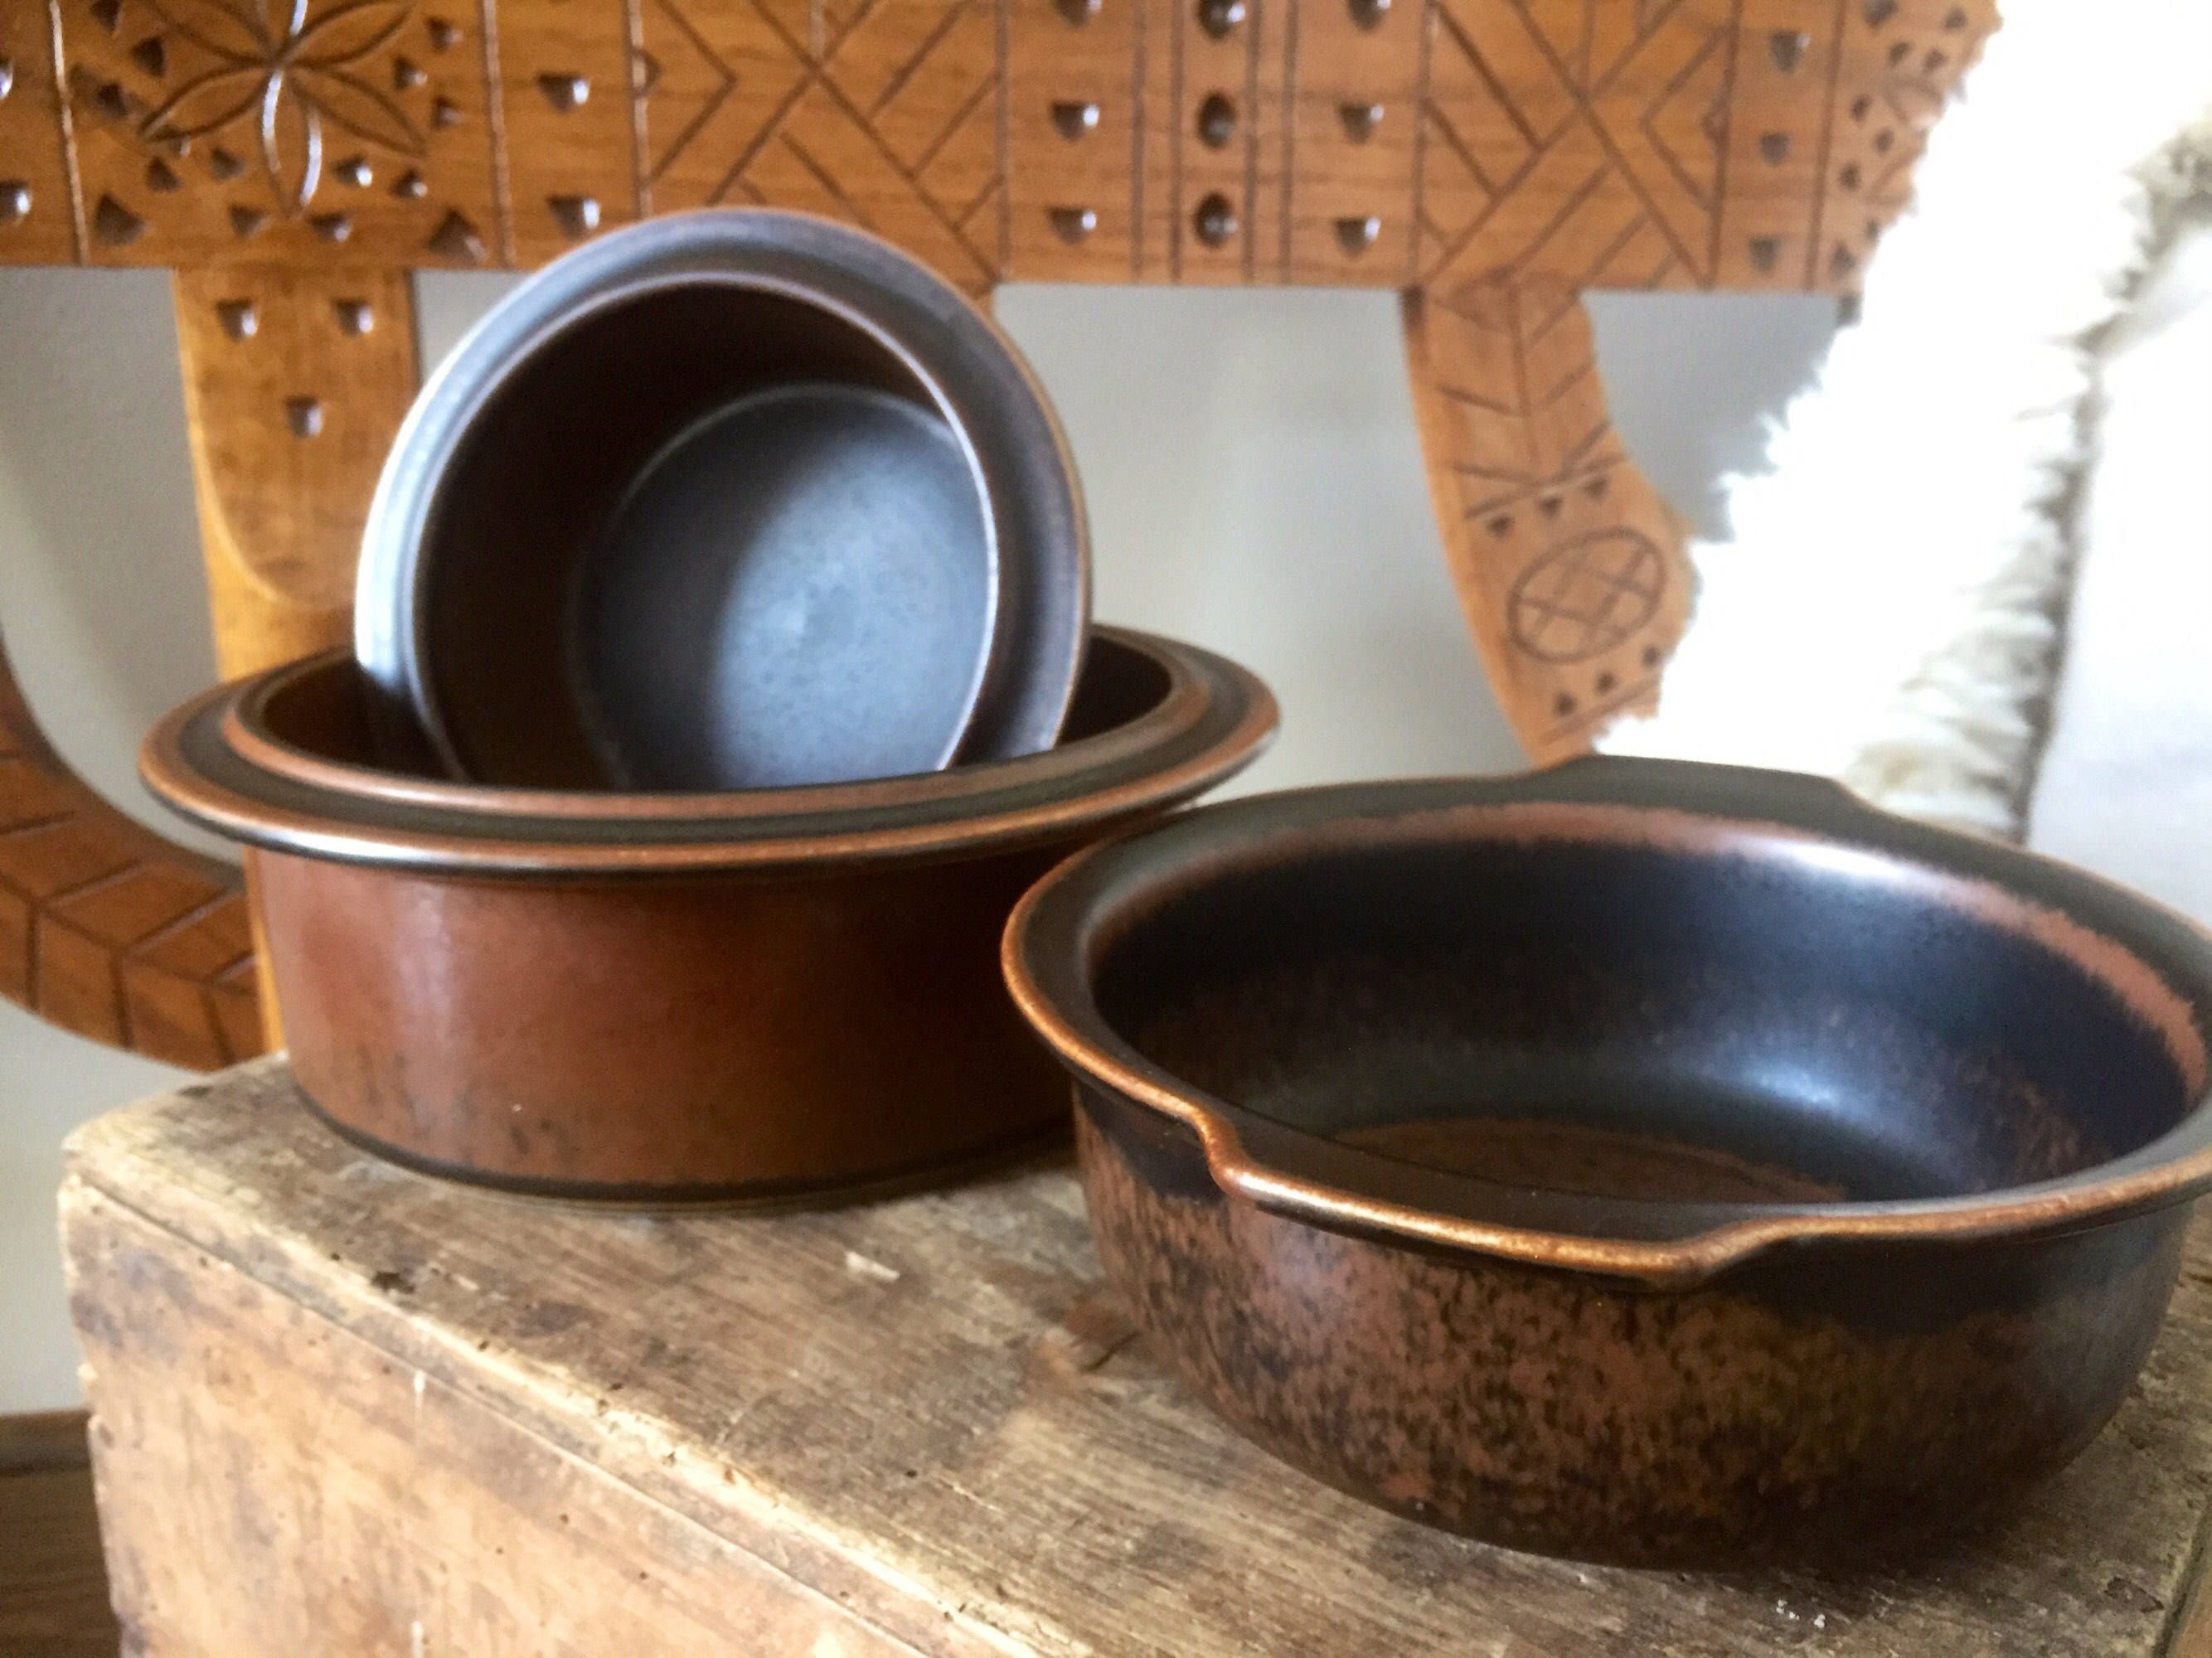 Set of 3 Arabia/ruska/serving/baking dish/ casserole/Ruska/ & Set of 3 Arabia/ruska/serving/baking dish/ casserole/Ruska/series ...